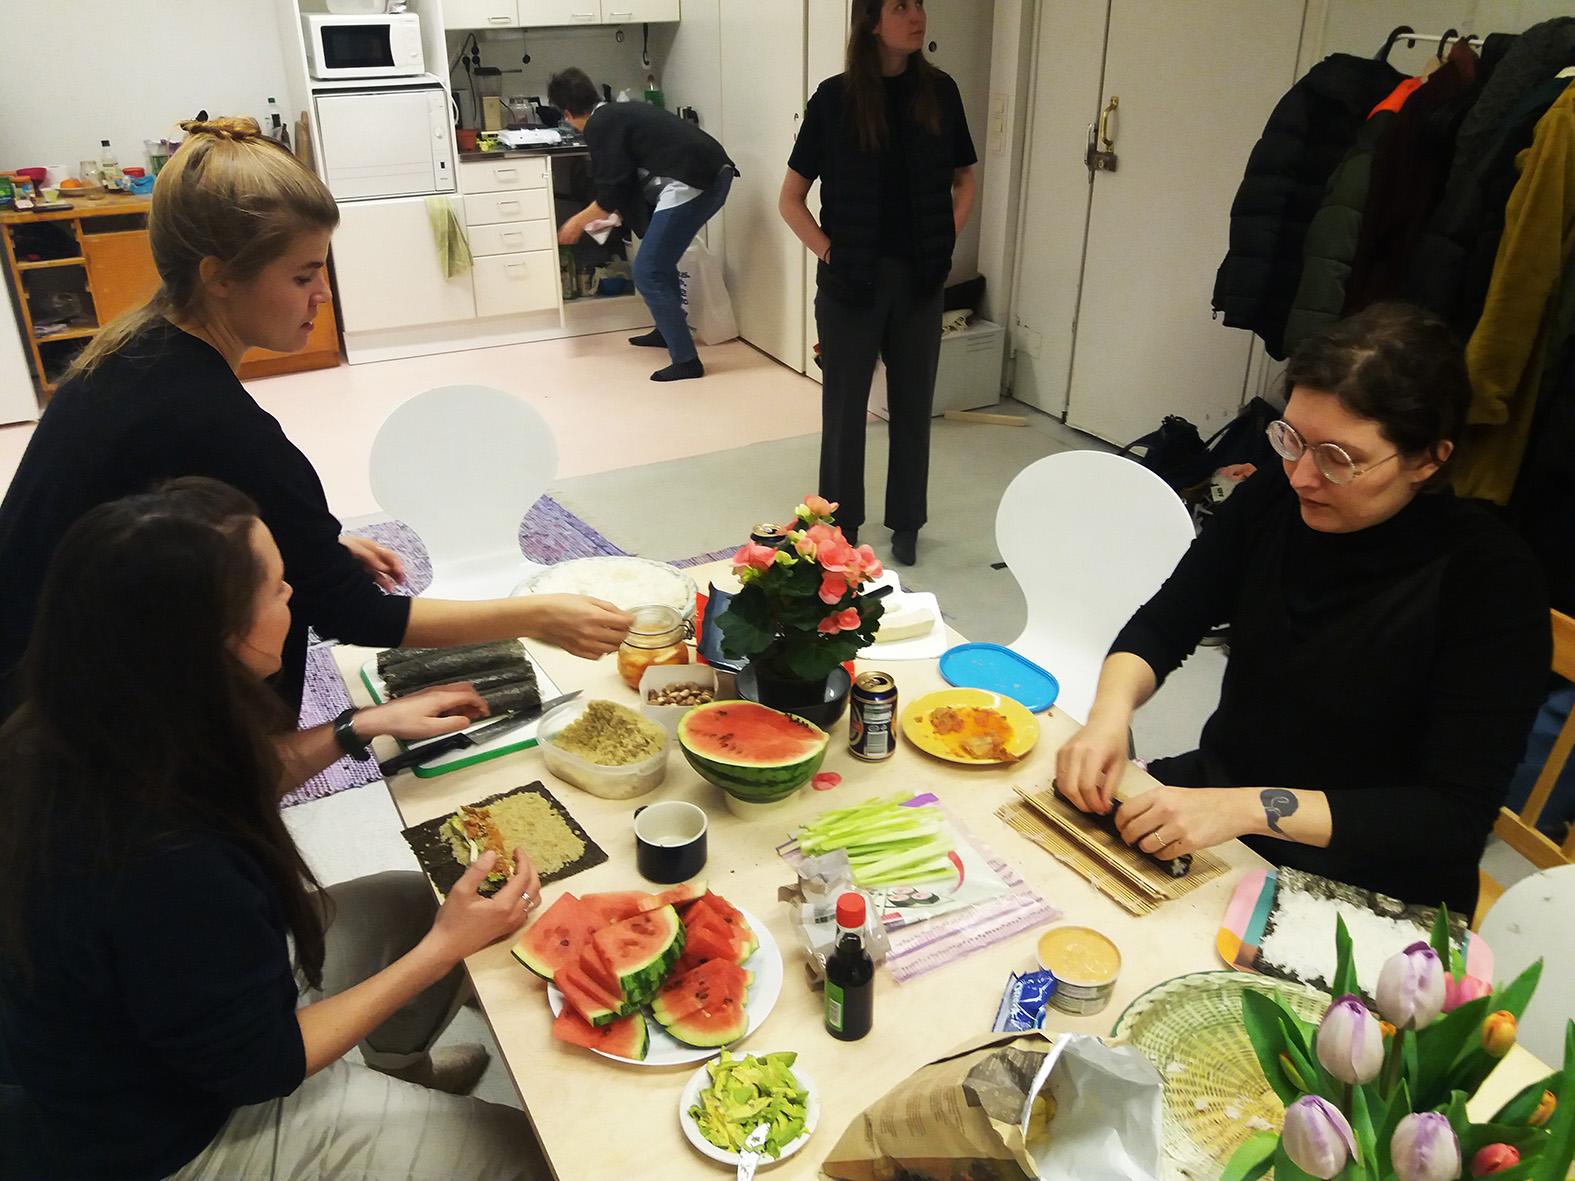 People preparing food at the Poimu kitchen